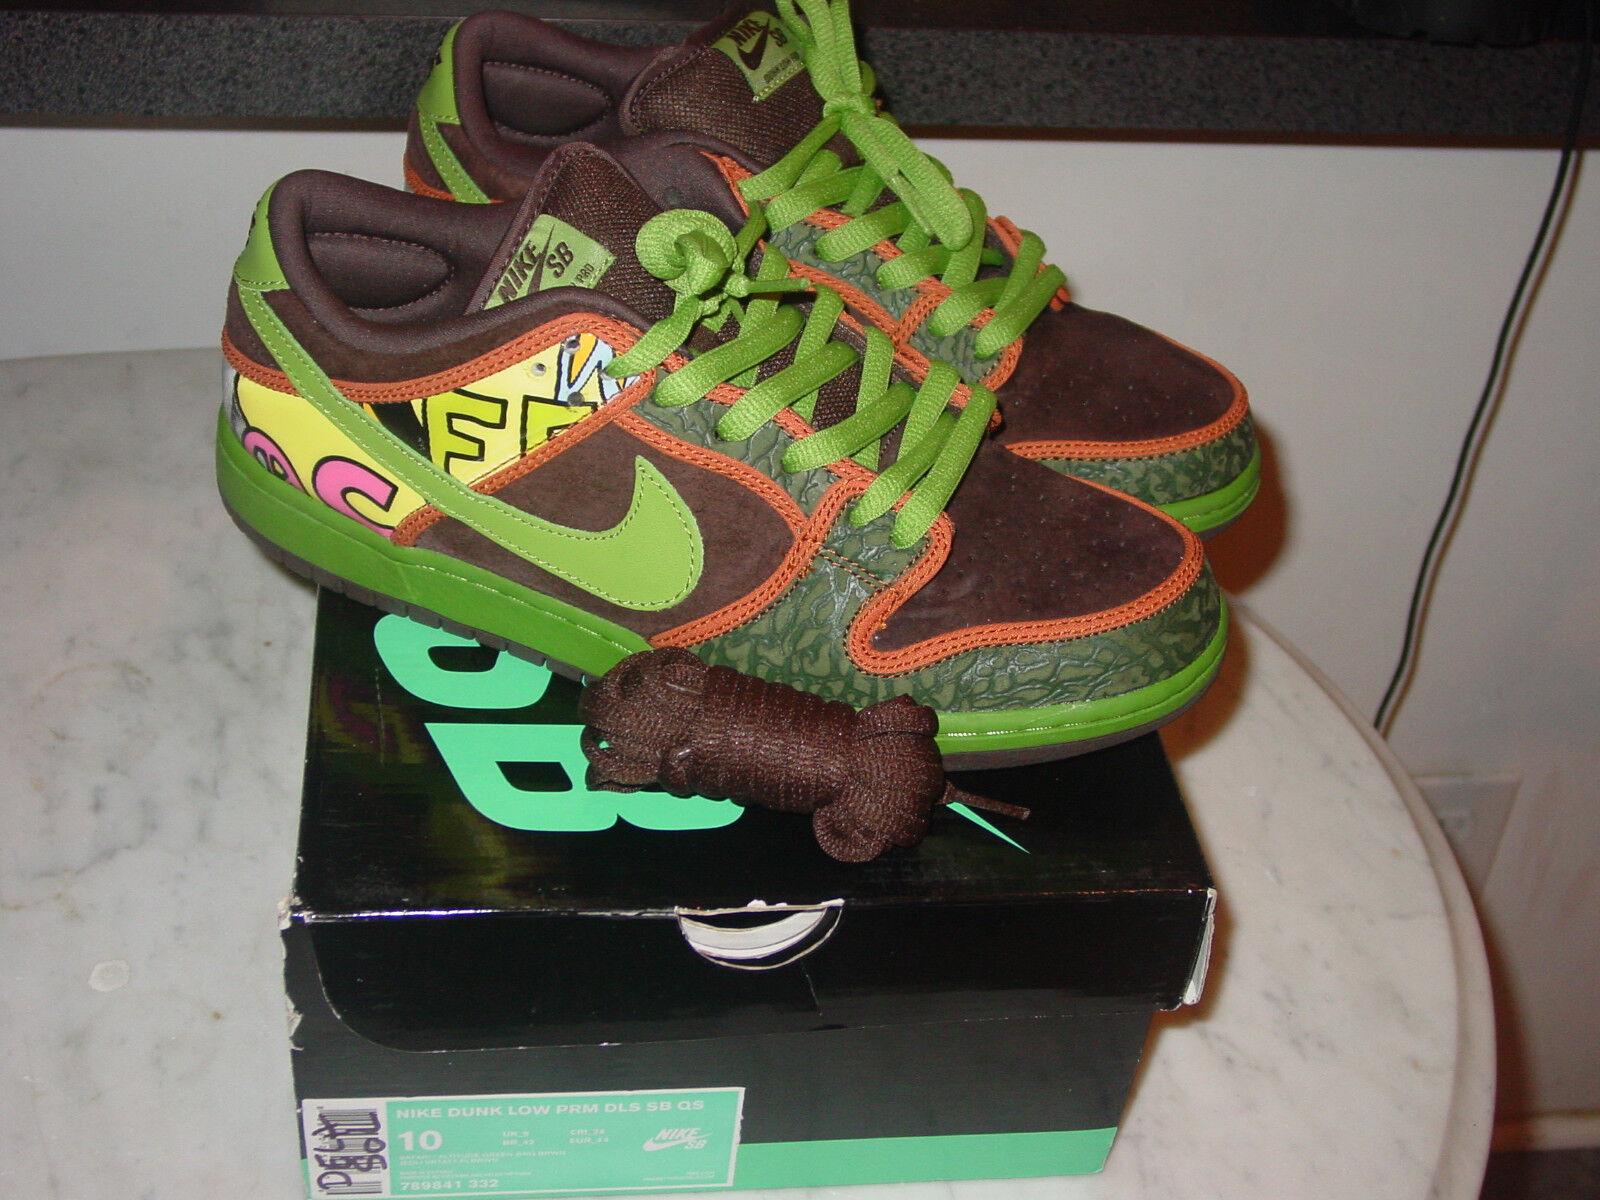 sneakers for cheap 168ec a89e8 2014 Nike Nike Nike SB Dunk Low Pro SB